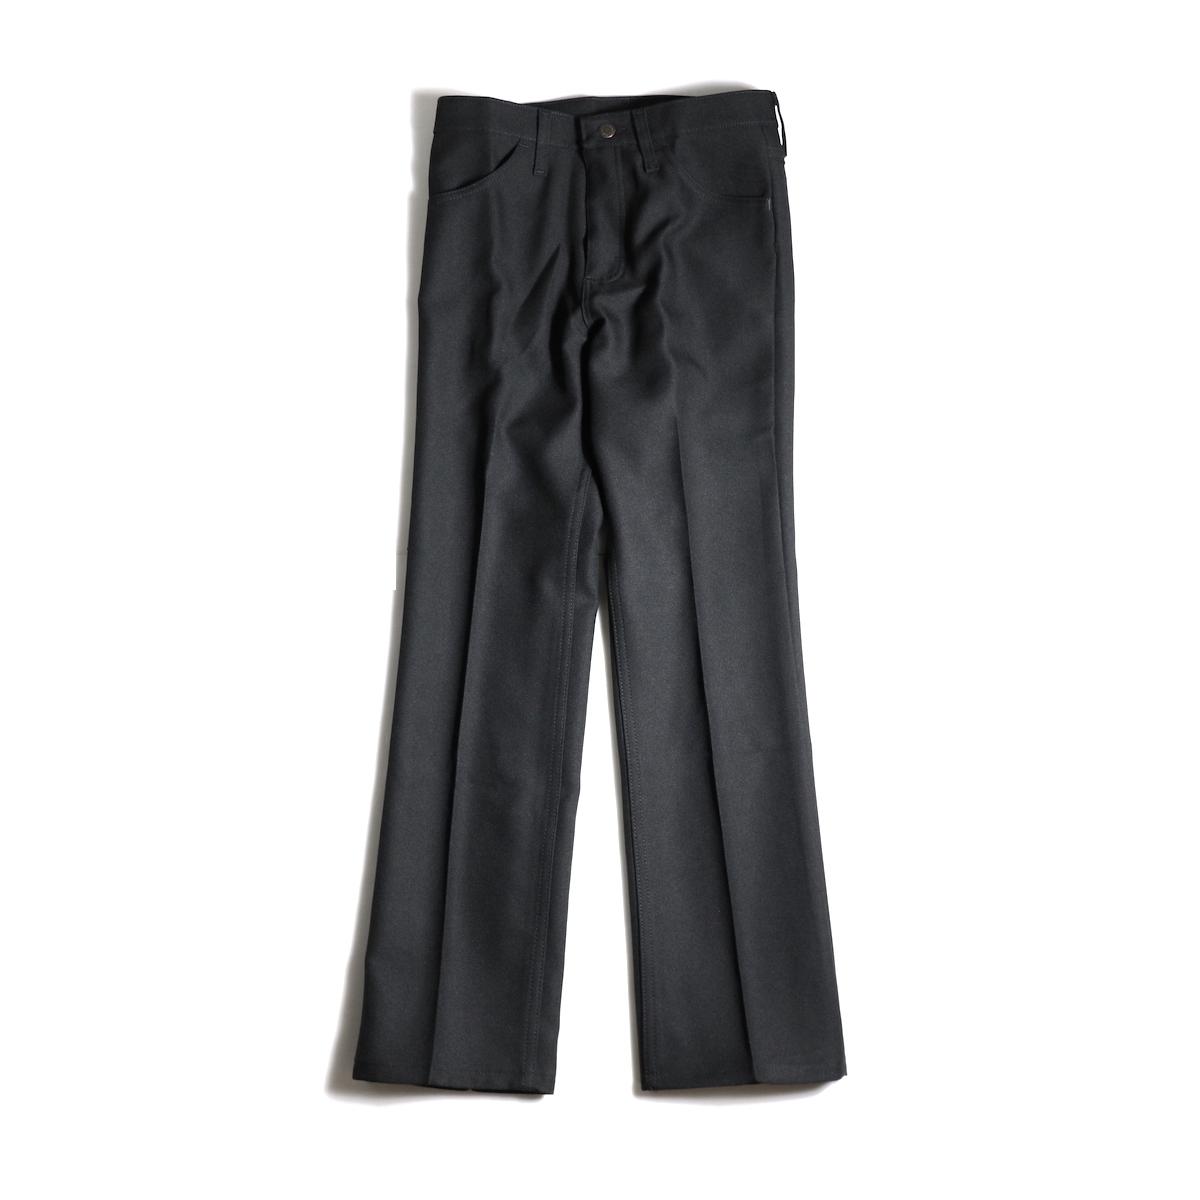 Wrangler / WRANCHER DRESS JEANS (Black)正面